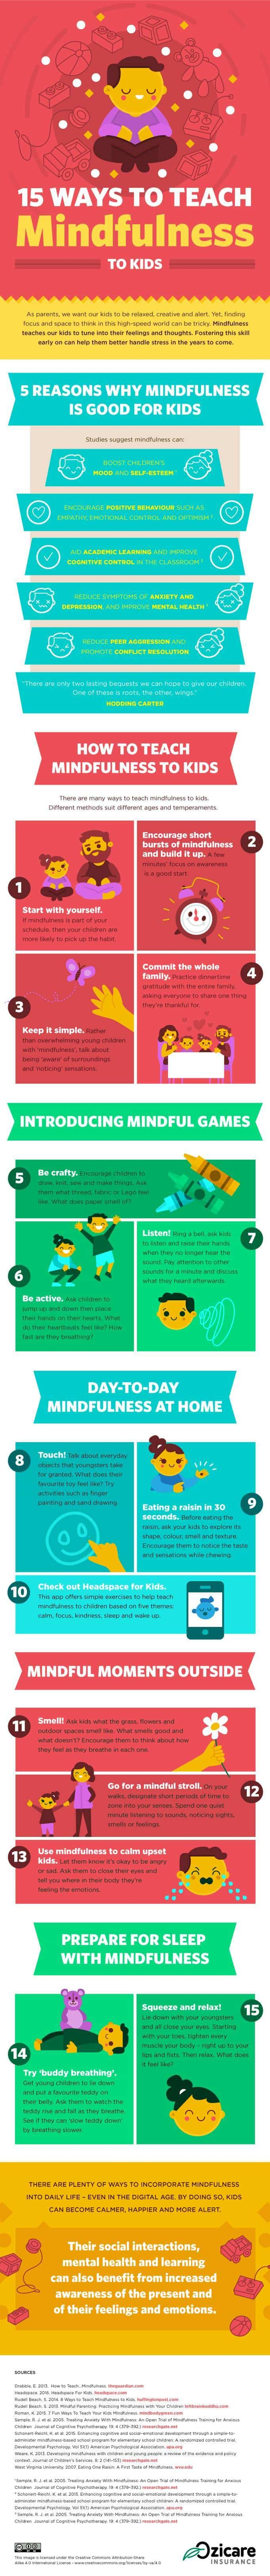 Infographic - Teaching mindfulness to kids